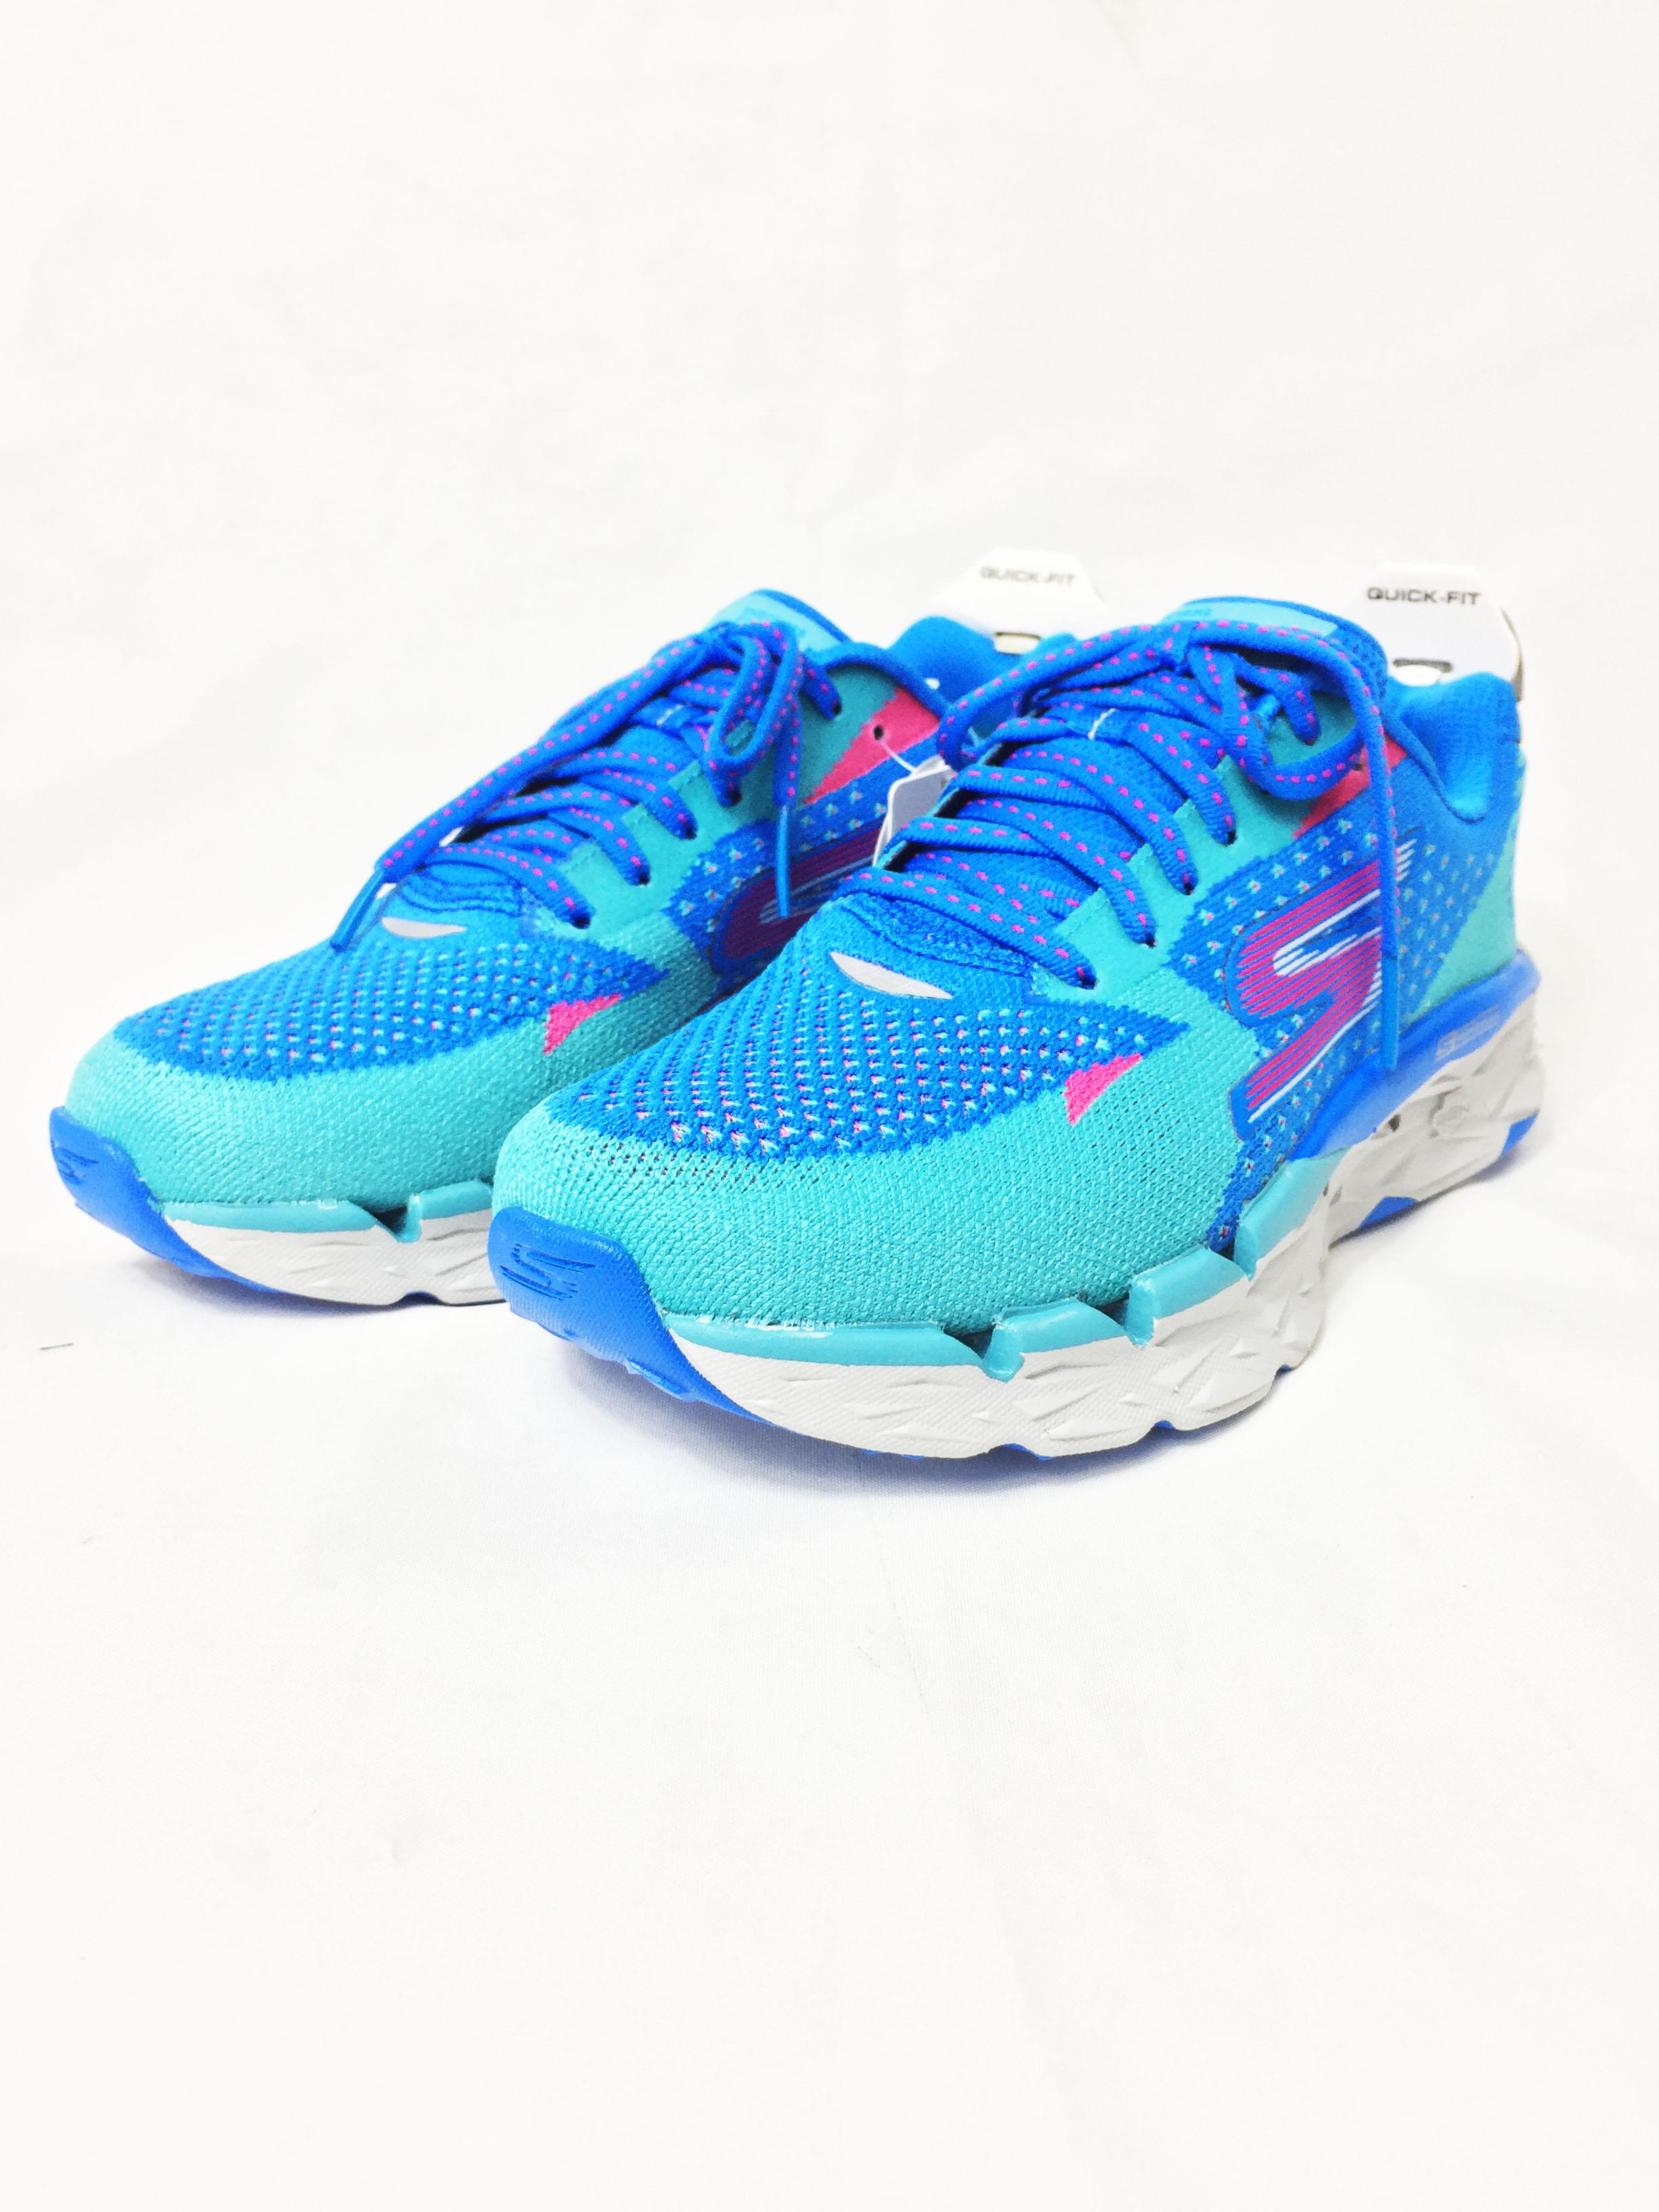 SKECHERS 女 慢跑鞋 GO RUN Ultra 2 (粉藍粉) 15050BLGR 【胖媛的店】